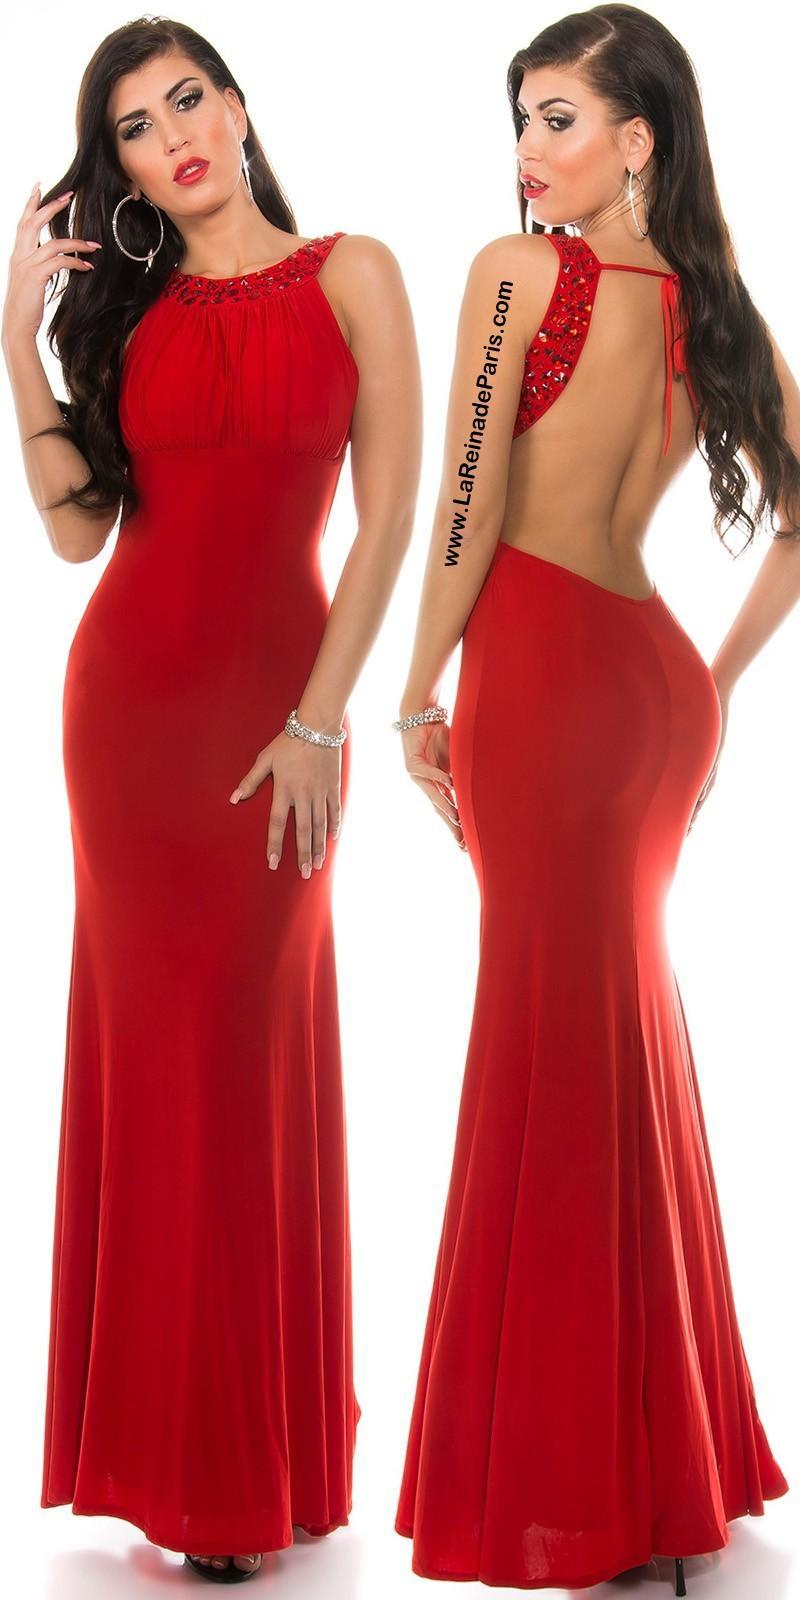 Vestido largo Grettel rojo